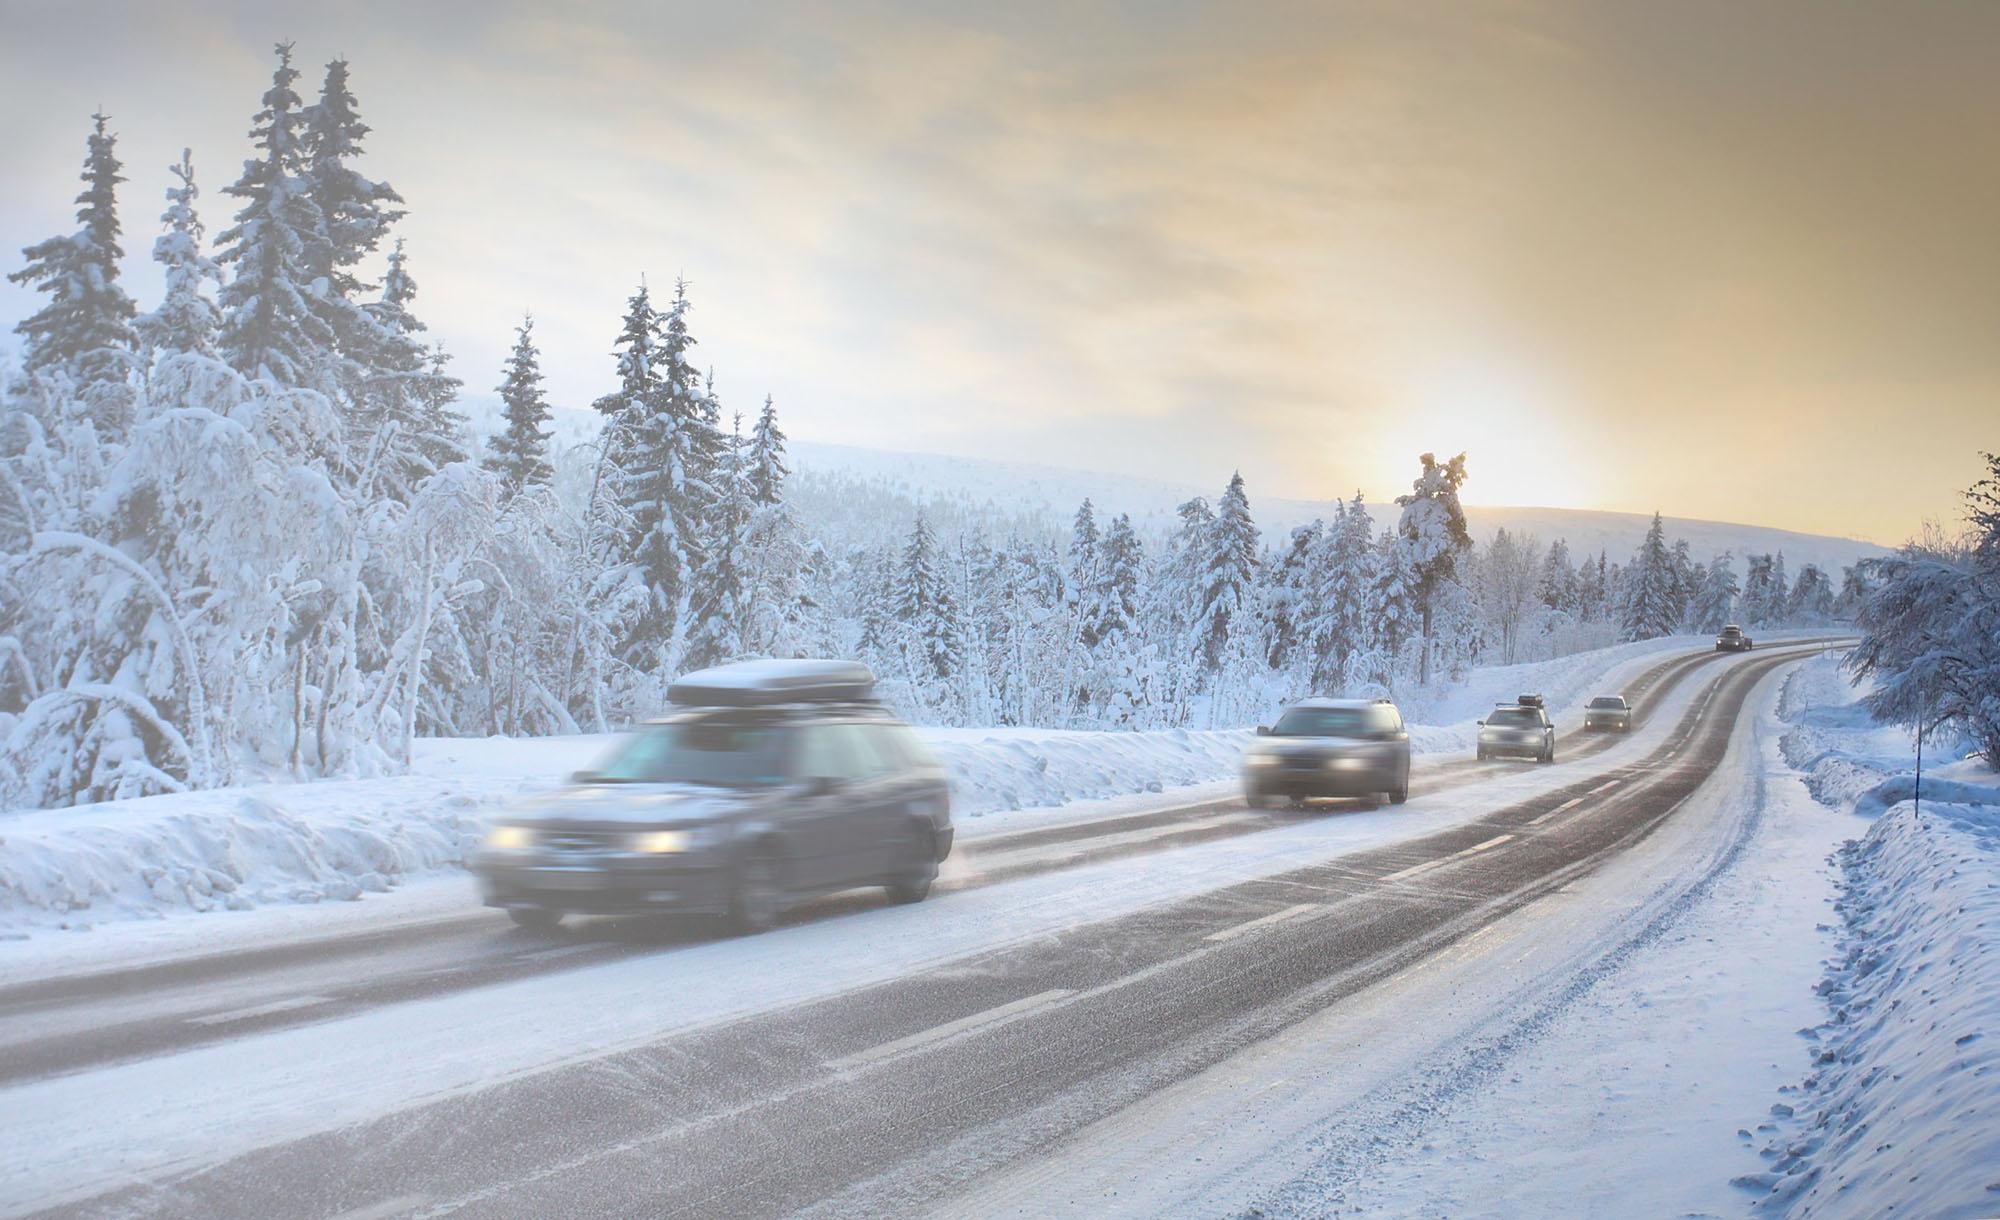 Sweden's Trafikverket improves road maintenance efforts with RoadCloud data